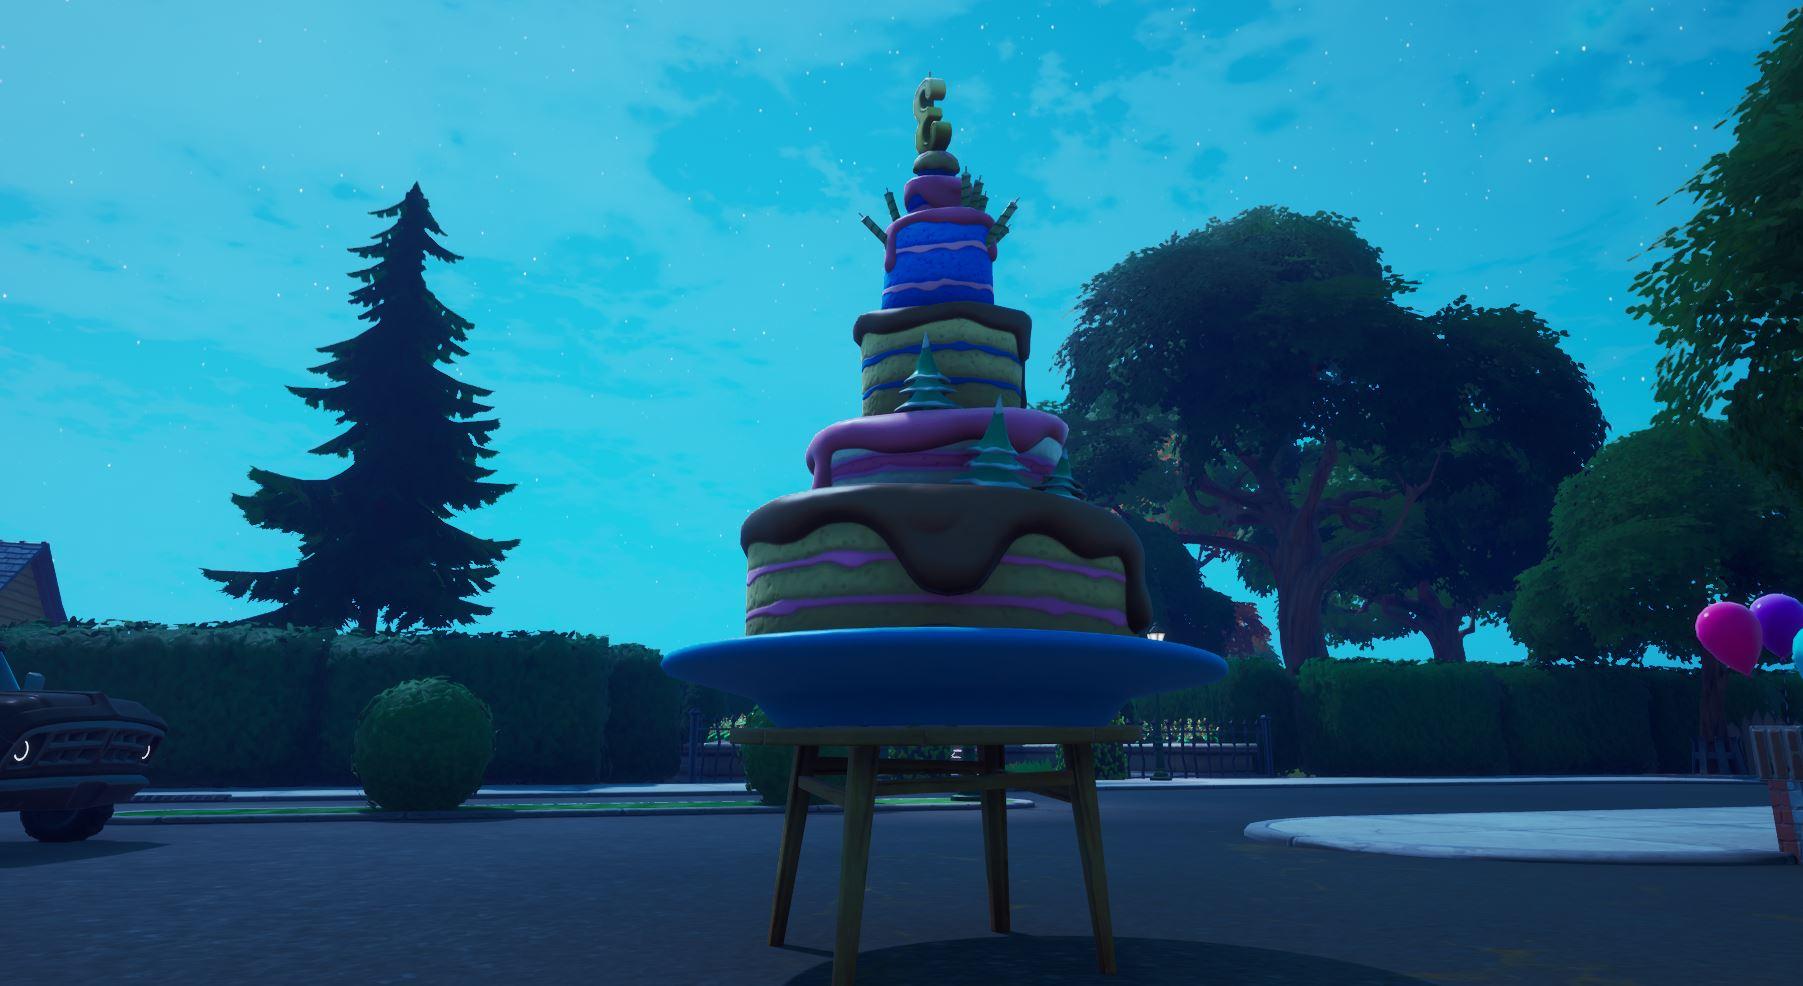 Fortnite Birthday Cake Locations Dance In Front Of Different Birthday Cakes Fortnite Insider